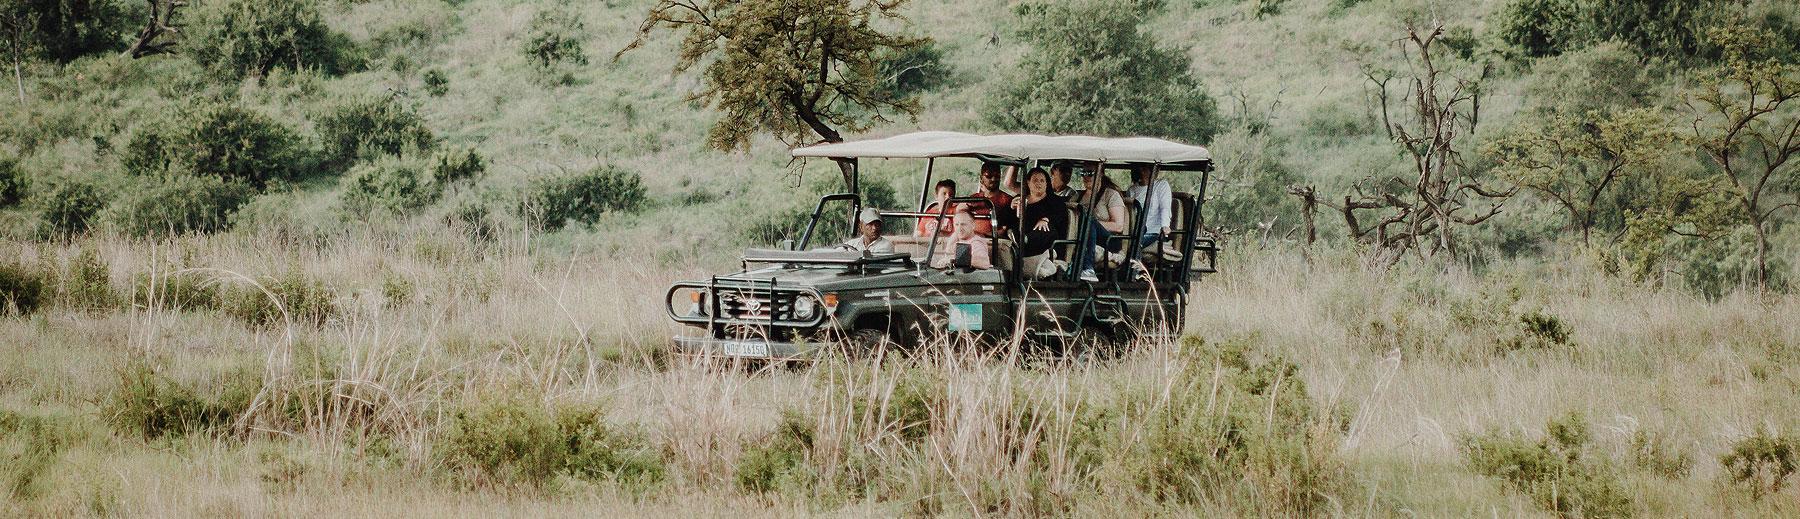 Tipping on Your Namibia Safari